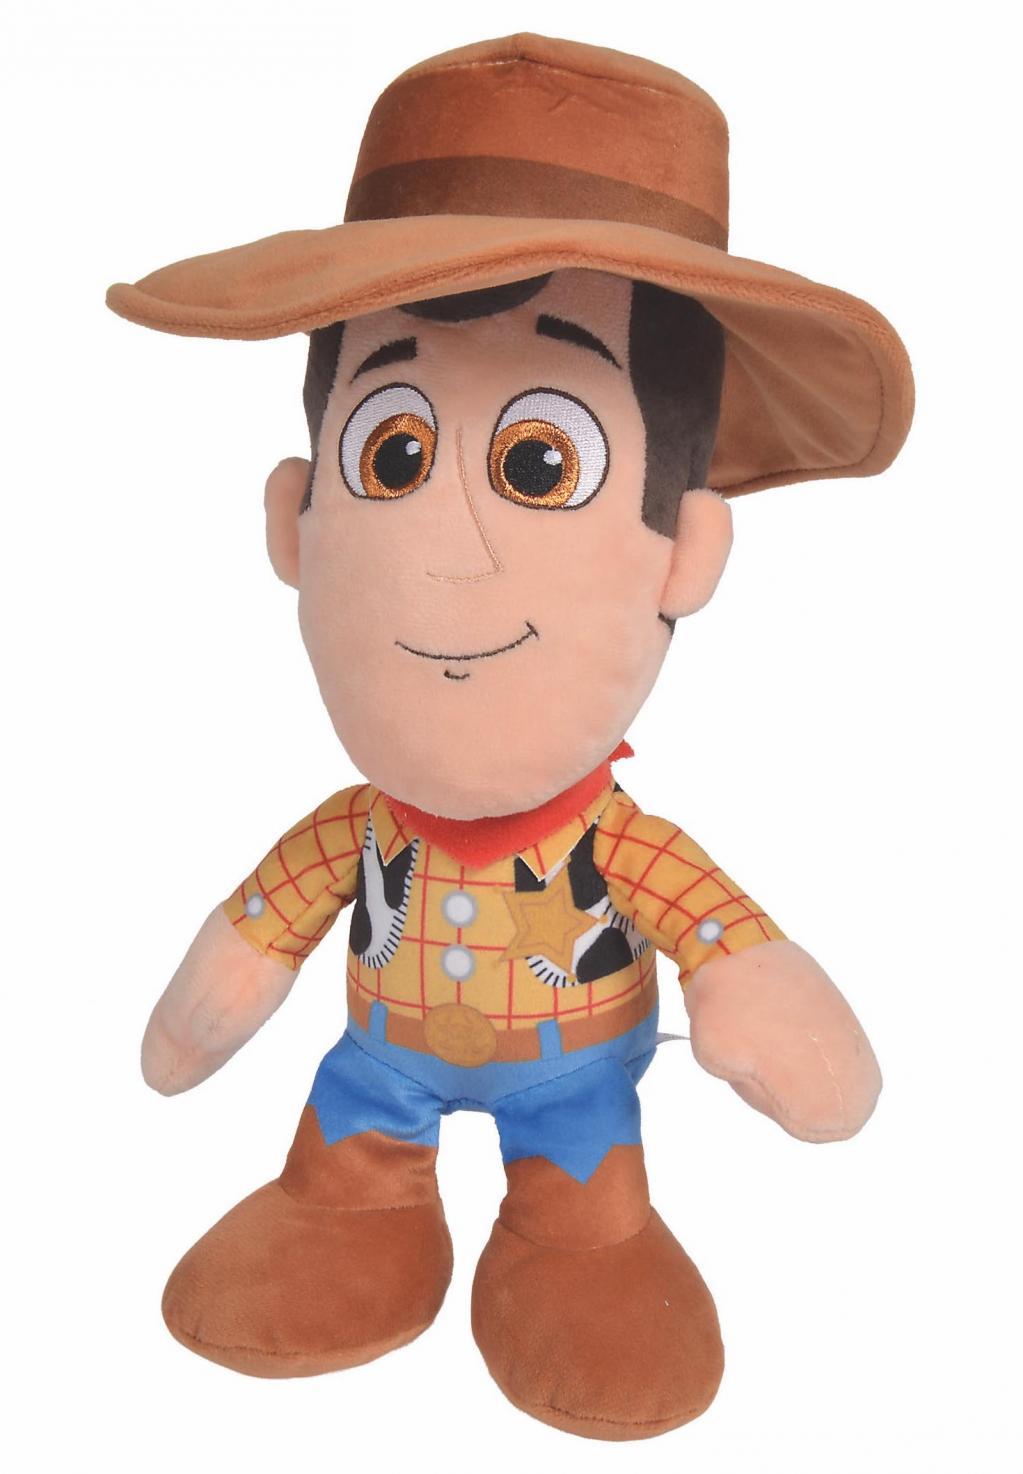 DISNEY - Peluche Toy Story 4 : Woody - 25cm